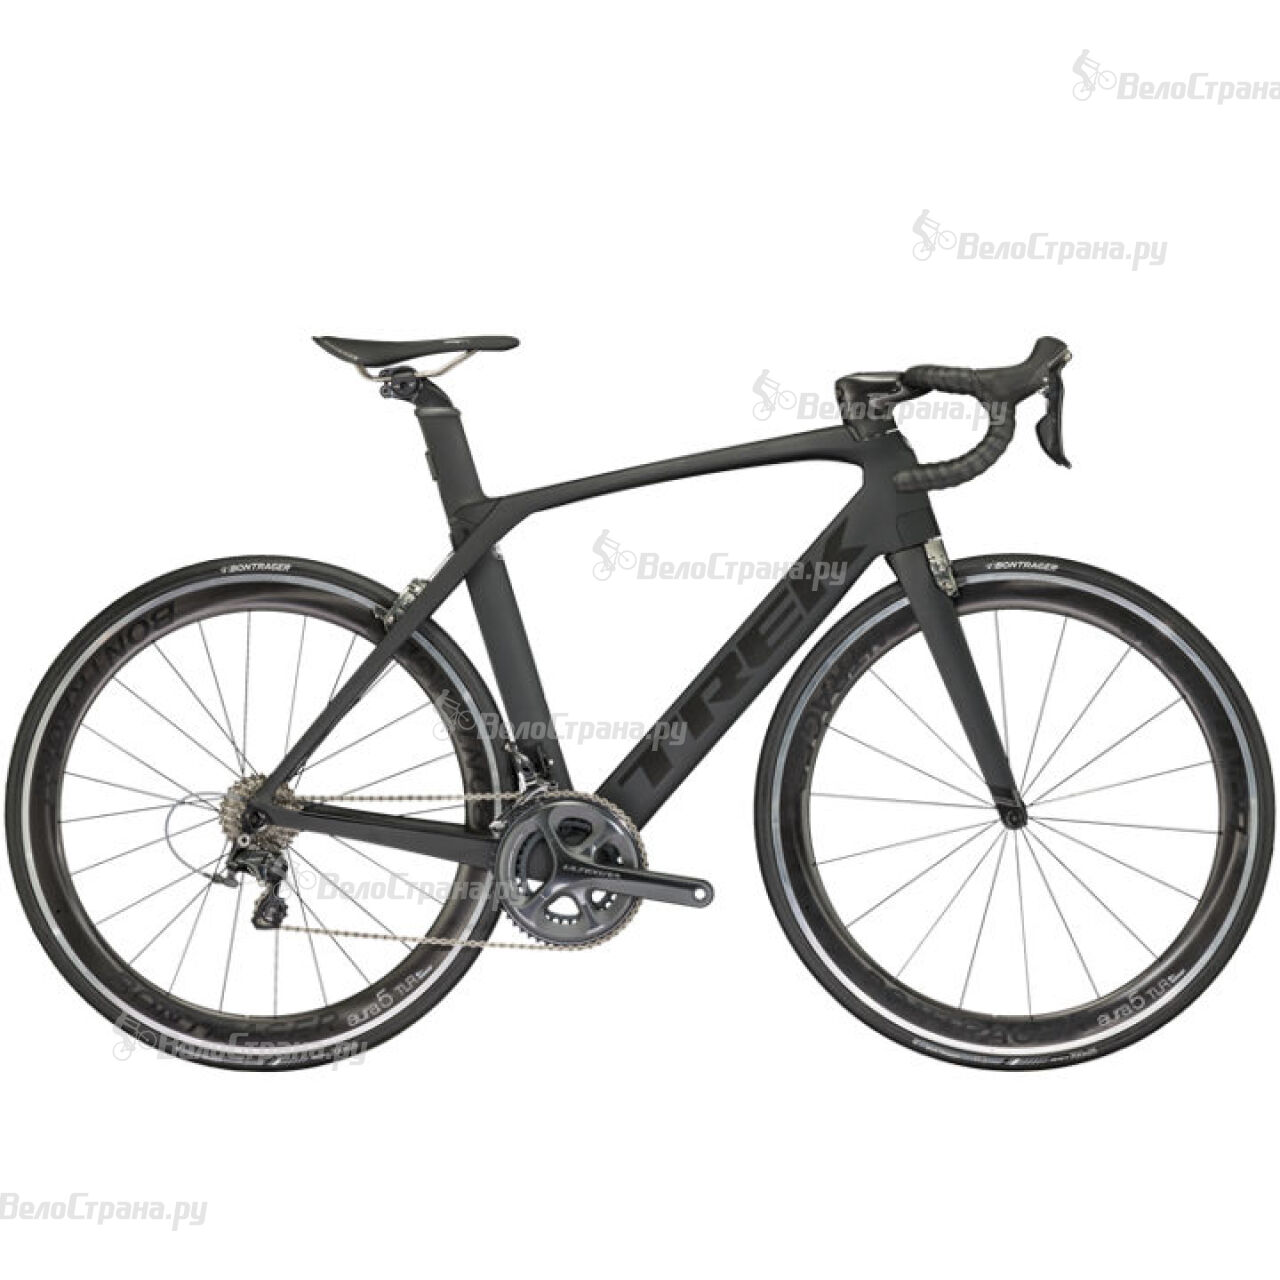 Велосипед Trek MADONE 9.2 C H2 (2017)